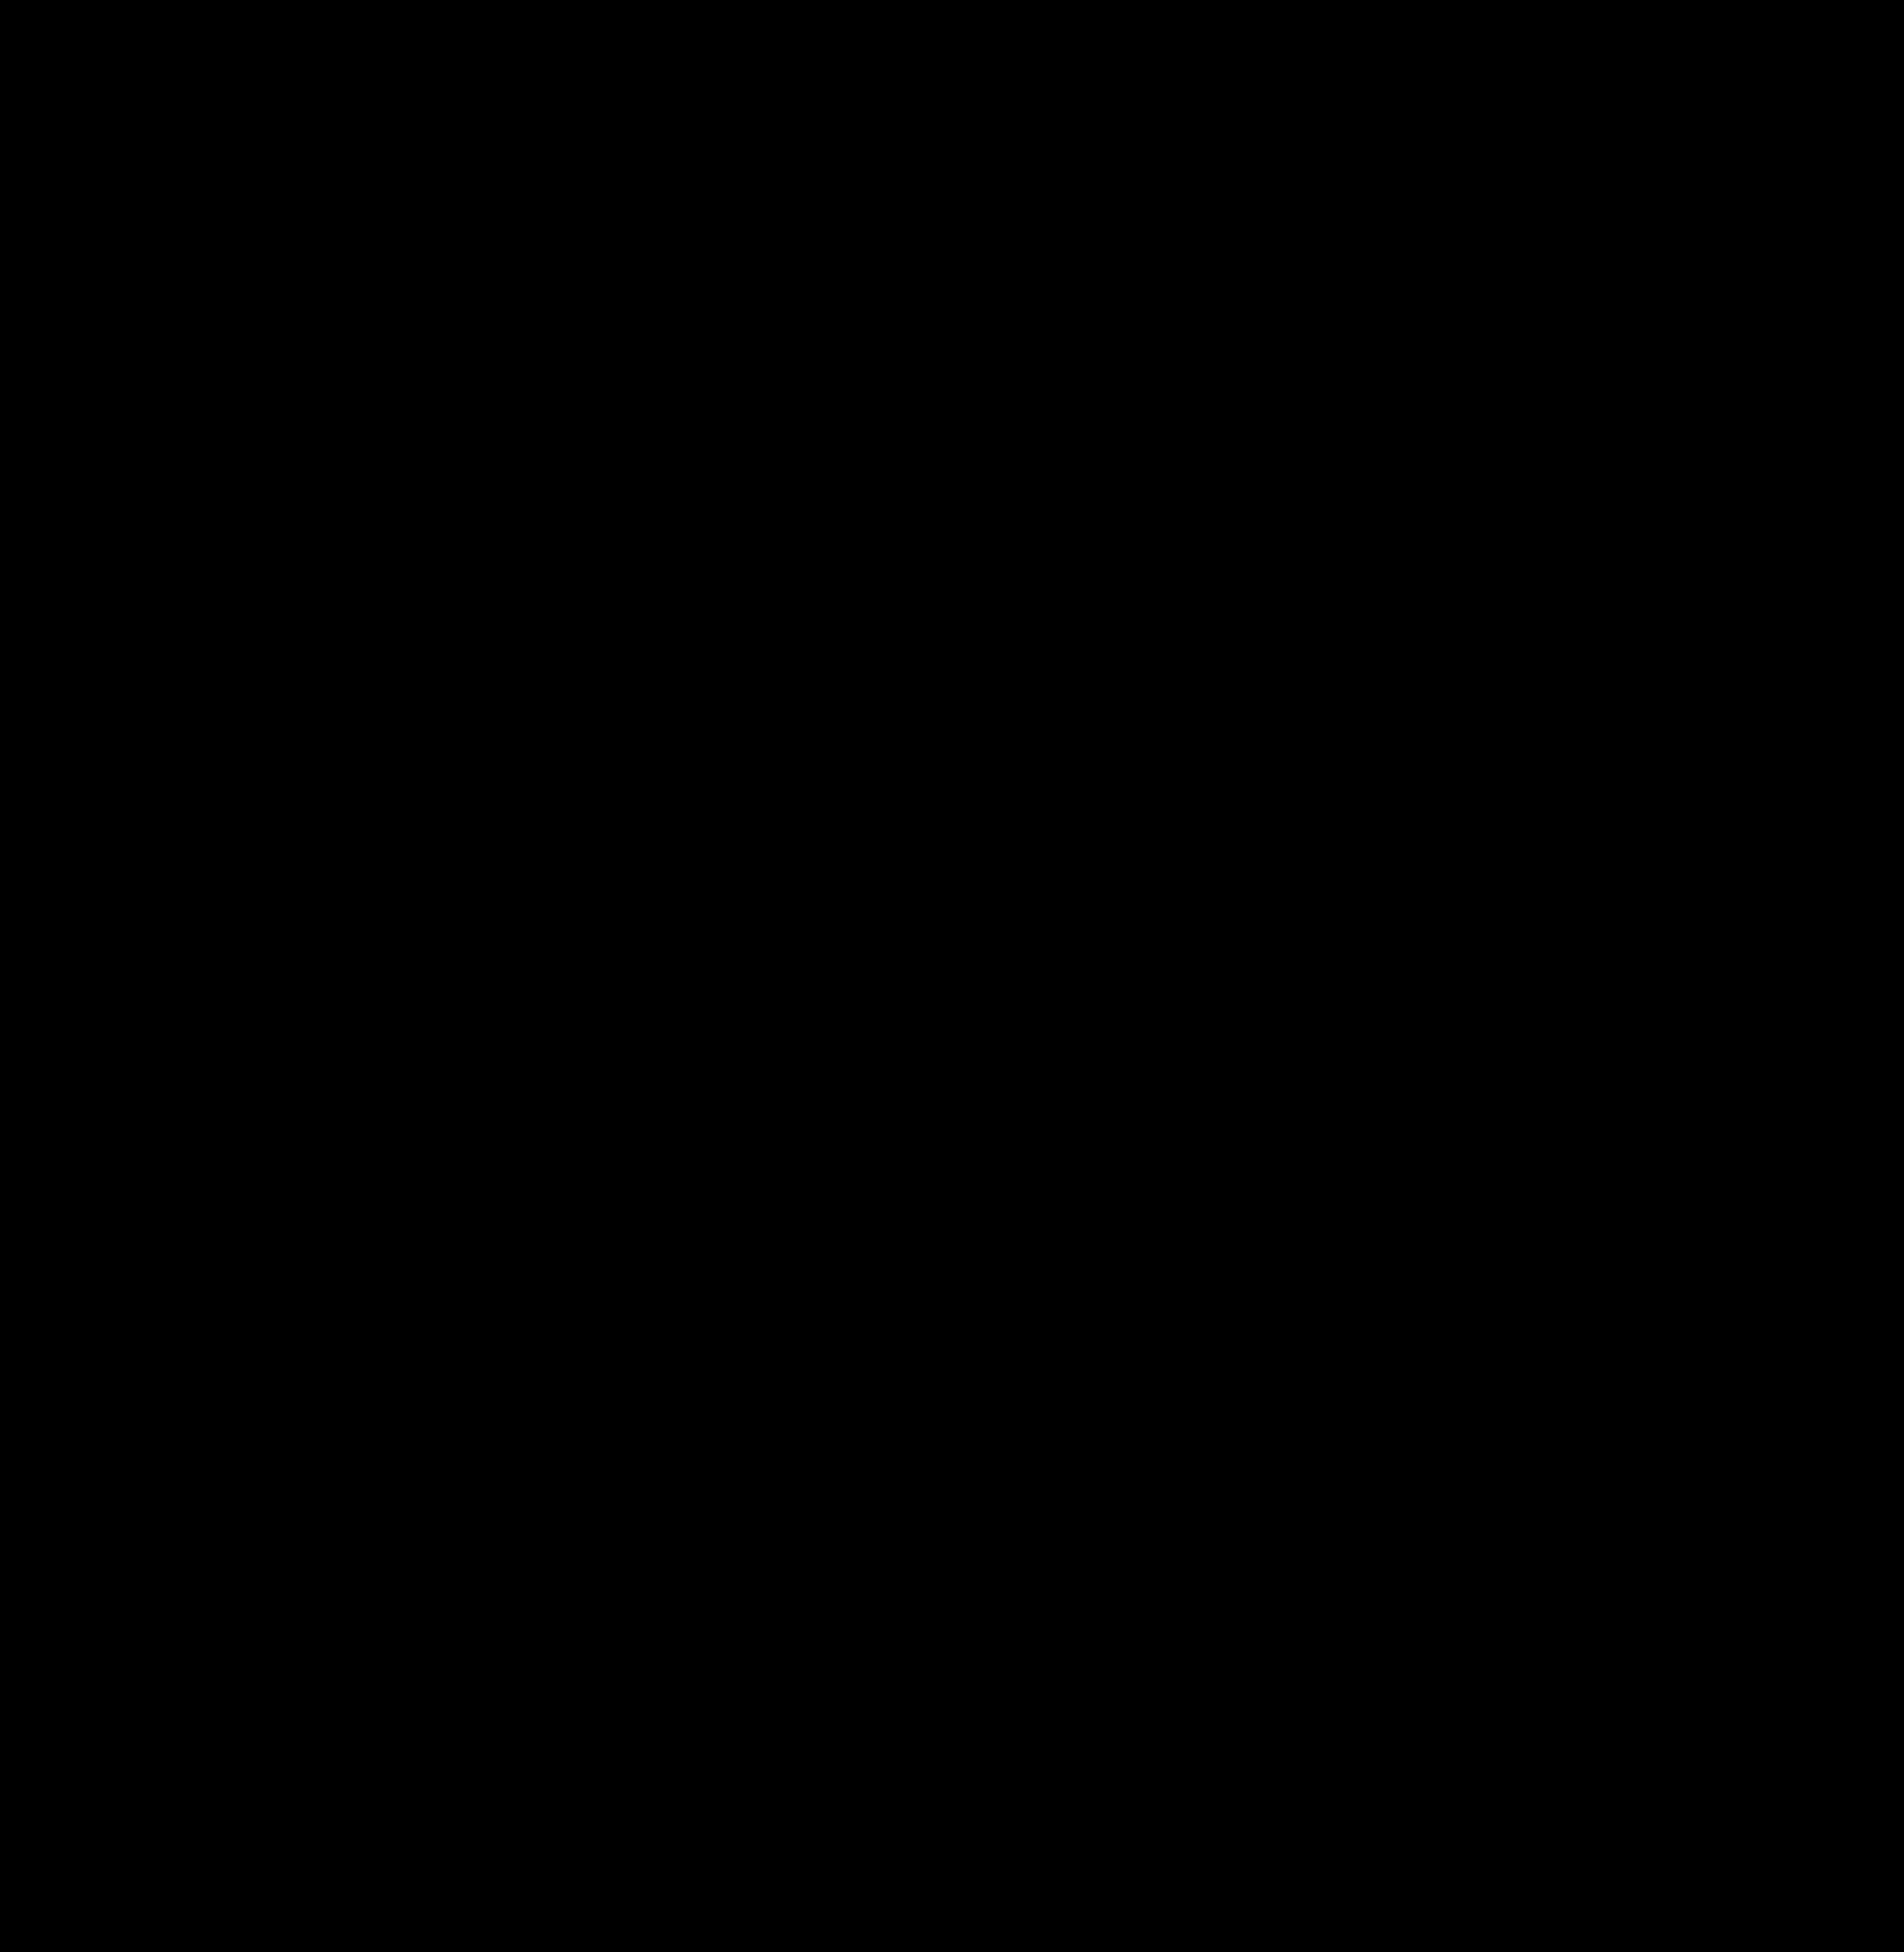 BIG IMAGE (PNG) - Handicapped PNG HD